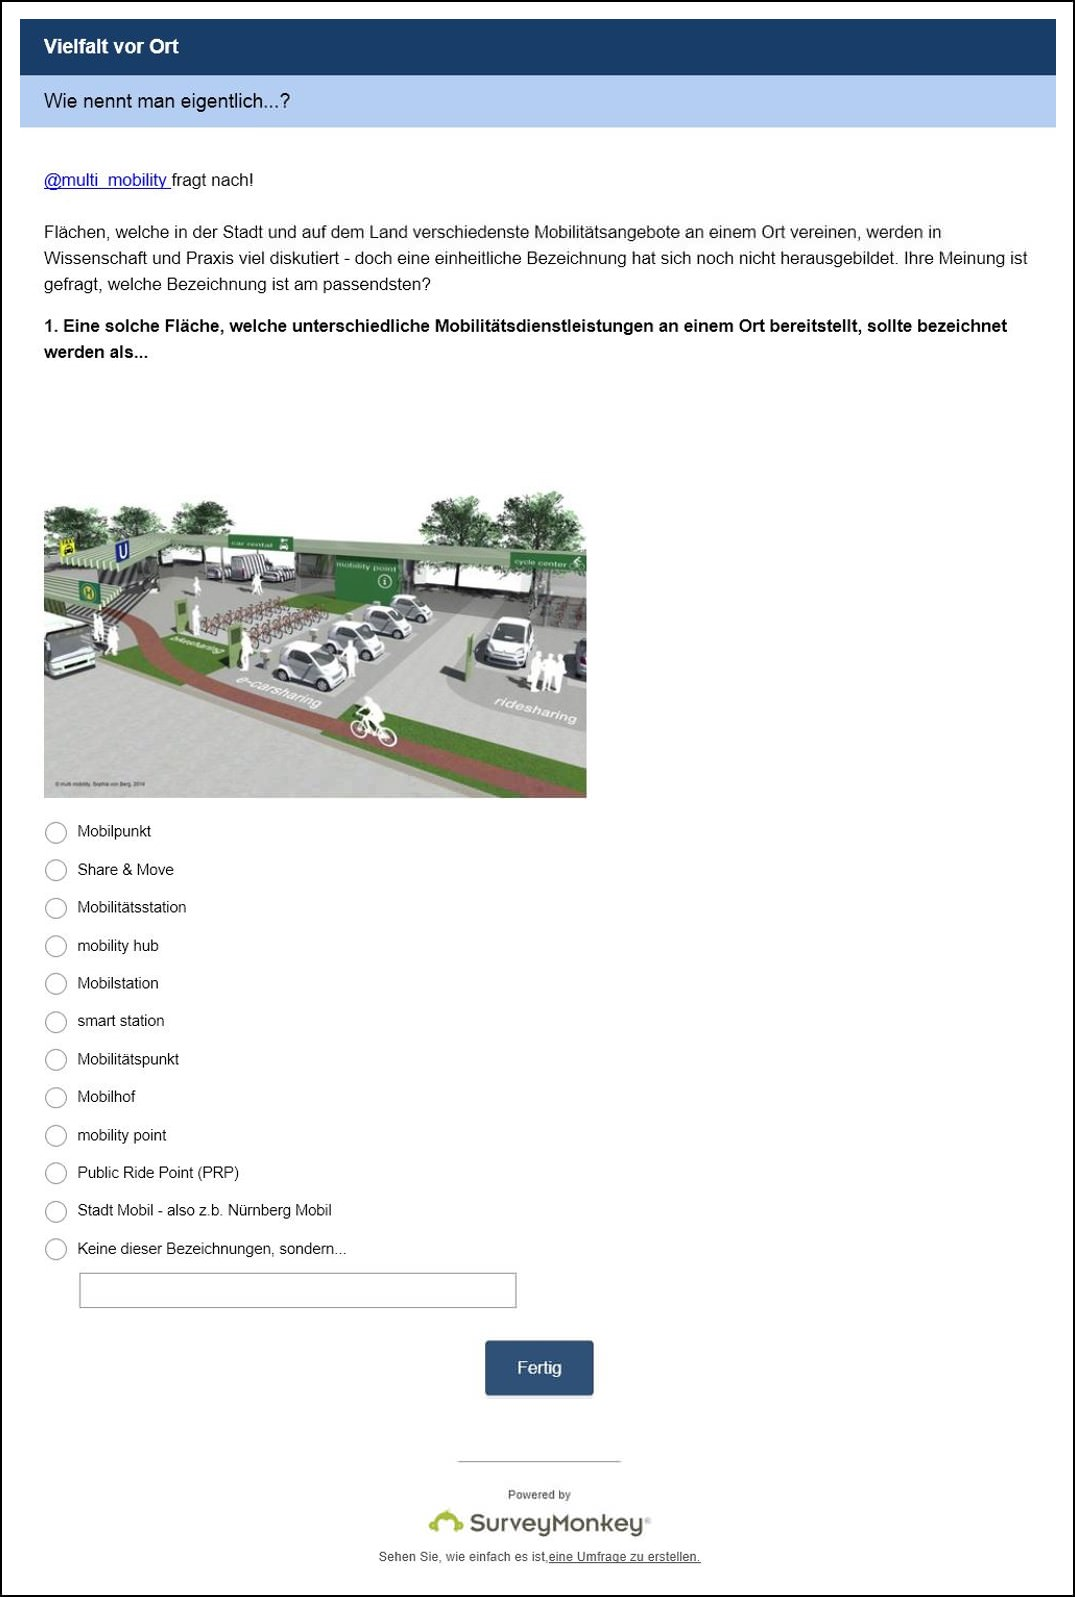 Mobilität vor Ort Mobilitätsstation mobilpunkt